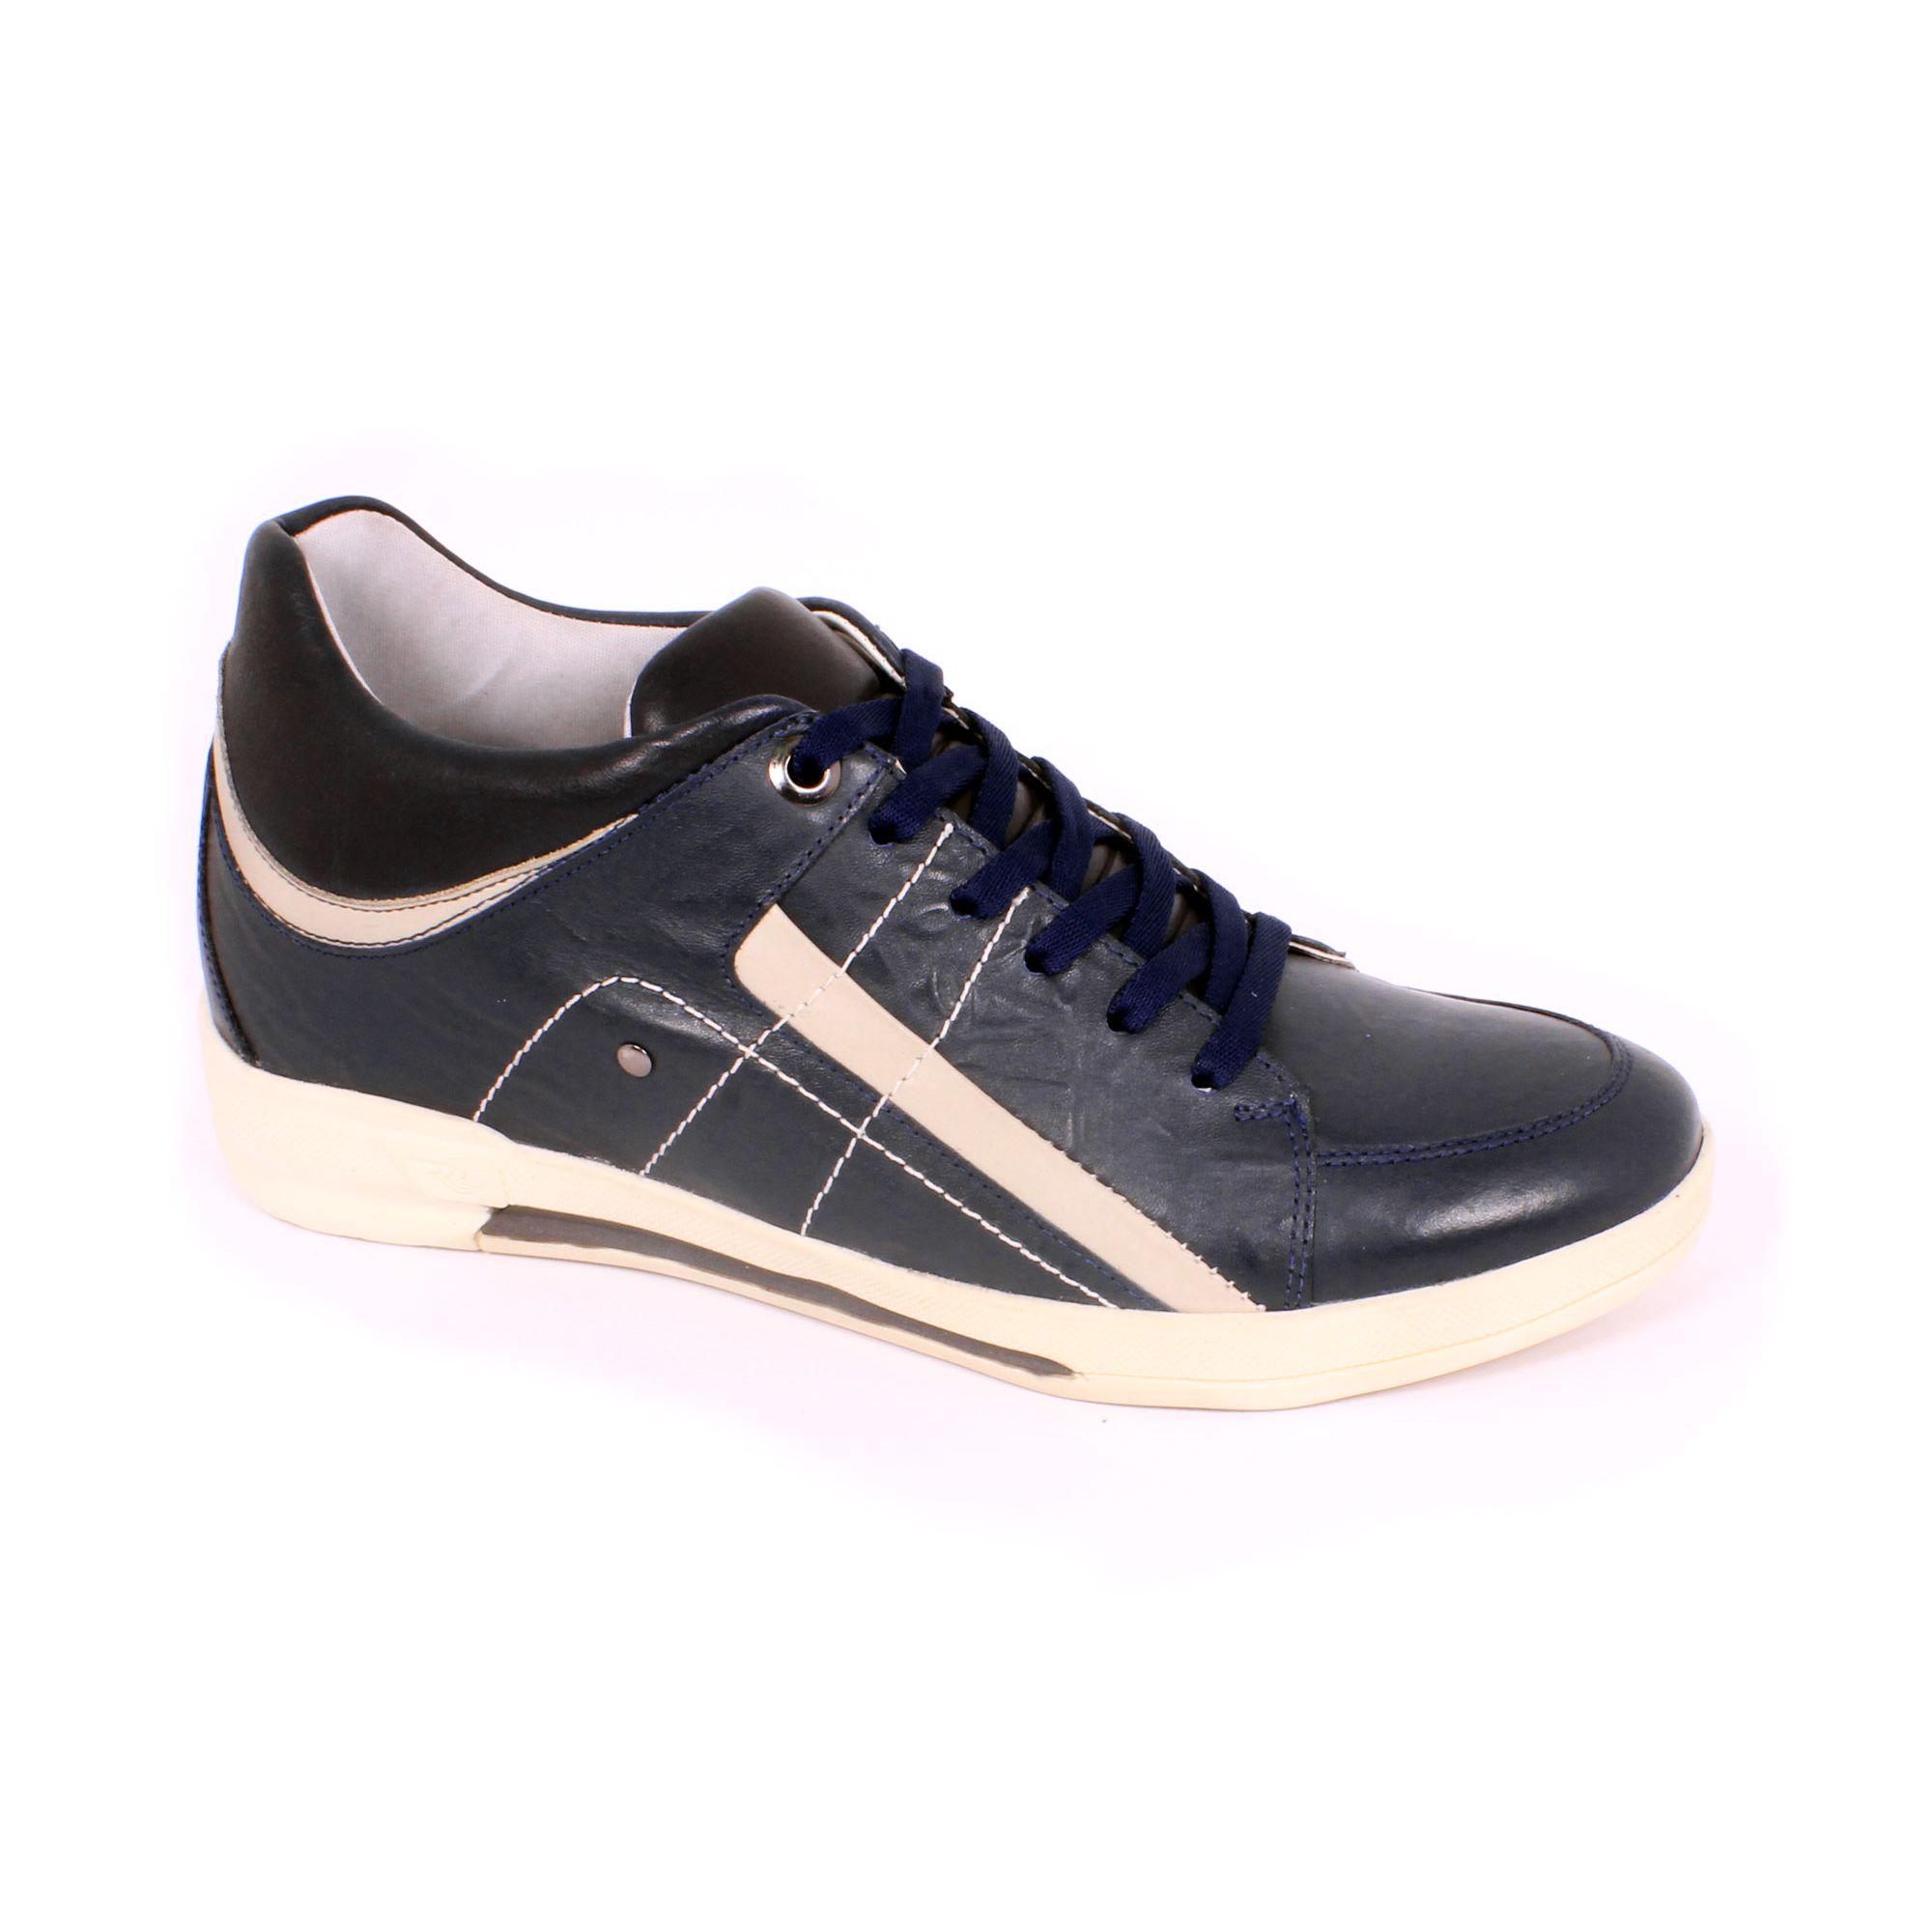 Zapato Casual Street Azul Max Denegri +7cm de Altura_70931